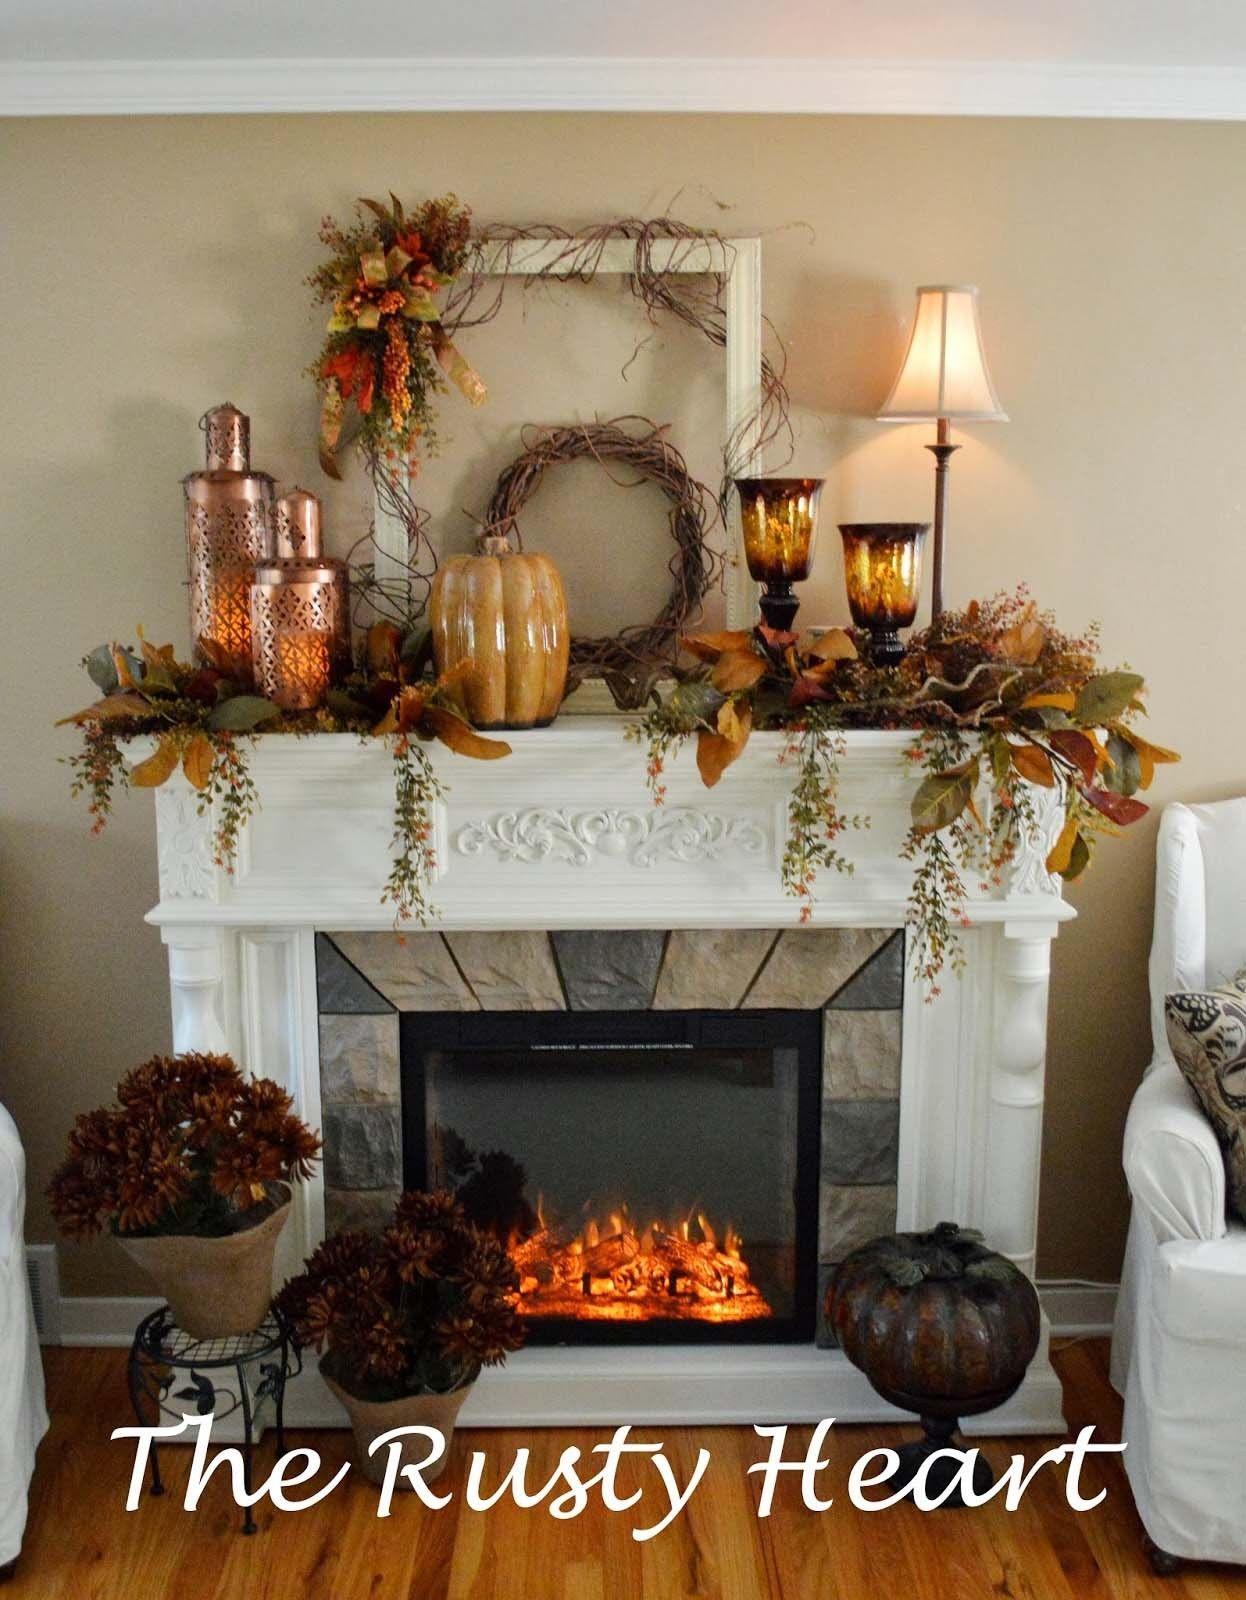 Fall Mantel Decorating Ideas Awesome 30 Amazing Fall Decorating Ideas For Your Fireplace Mantel In 2020 Fall Fireplace Fall Thanksgiving Decor Fall Mantle Decor